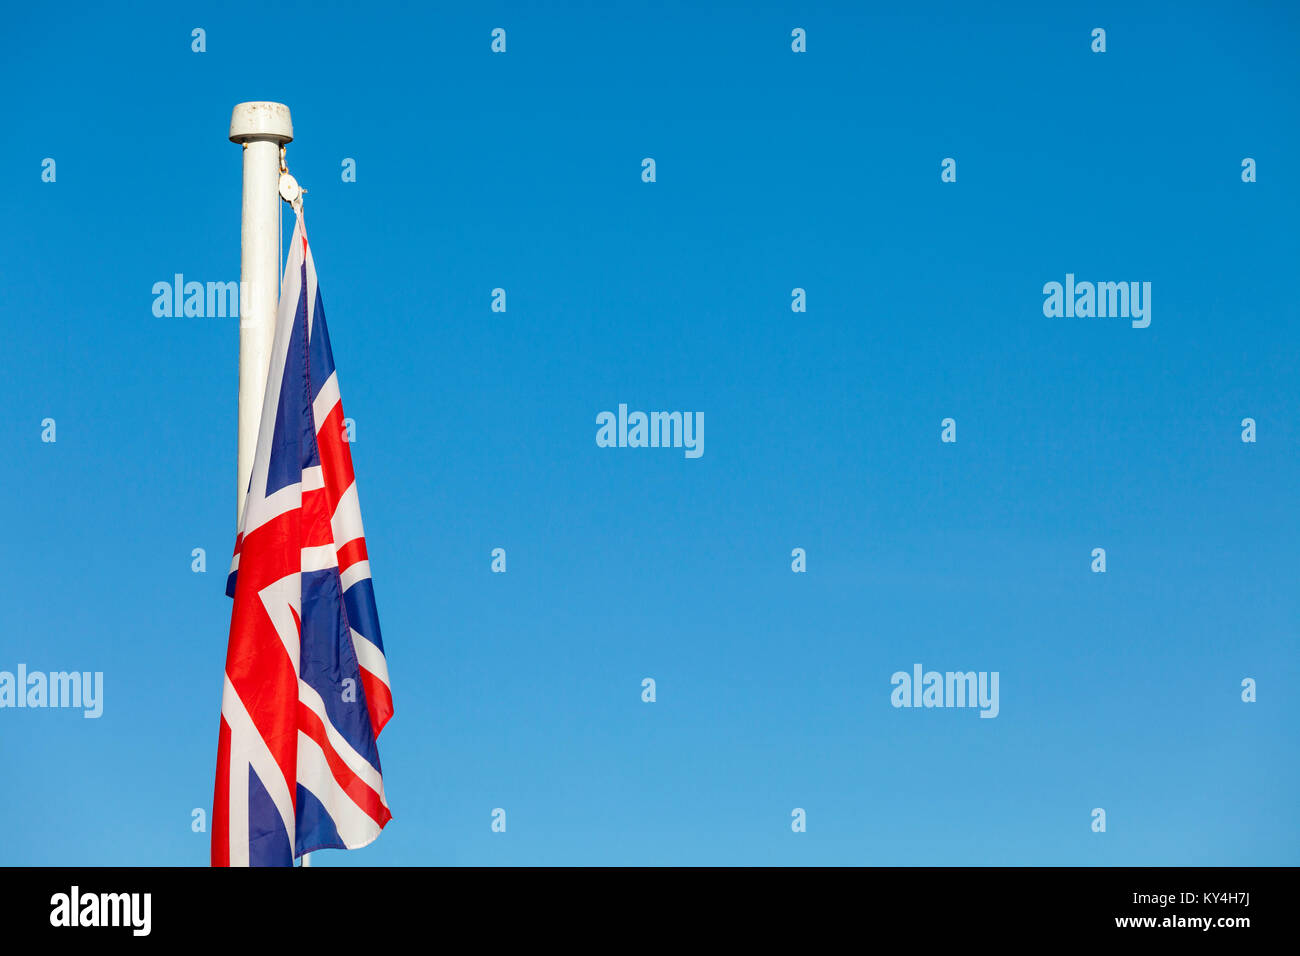 Union Jack flag on a bright blue sky background - Stock Image